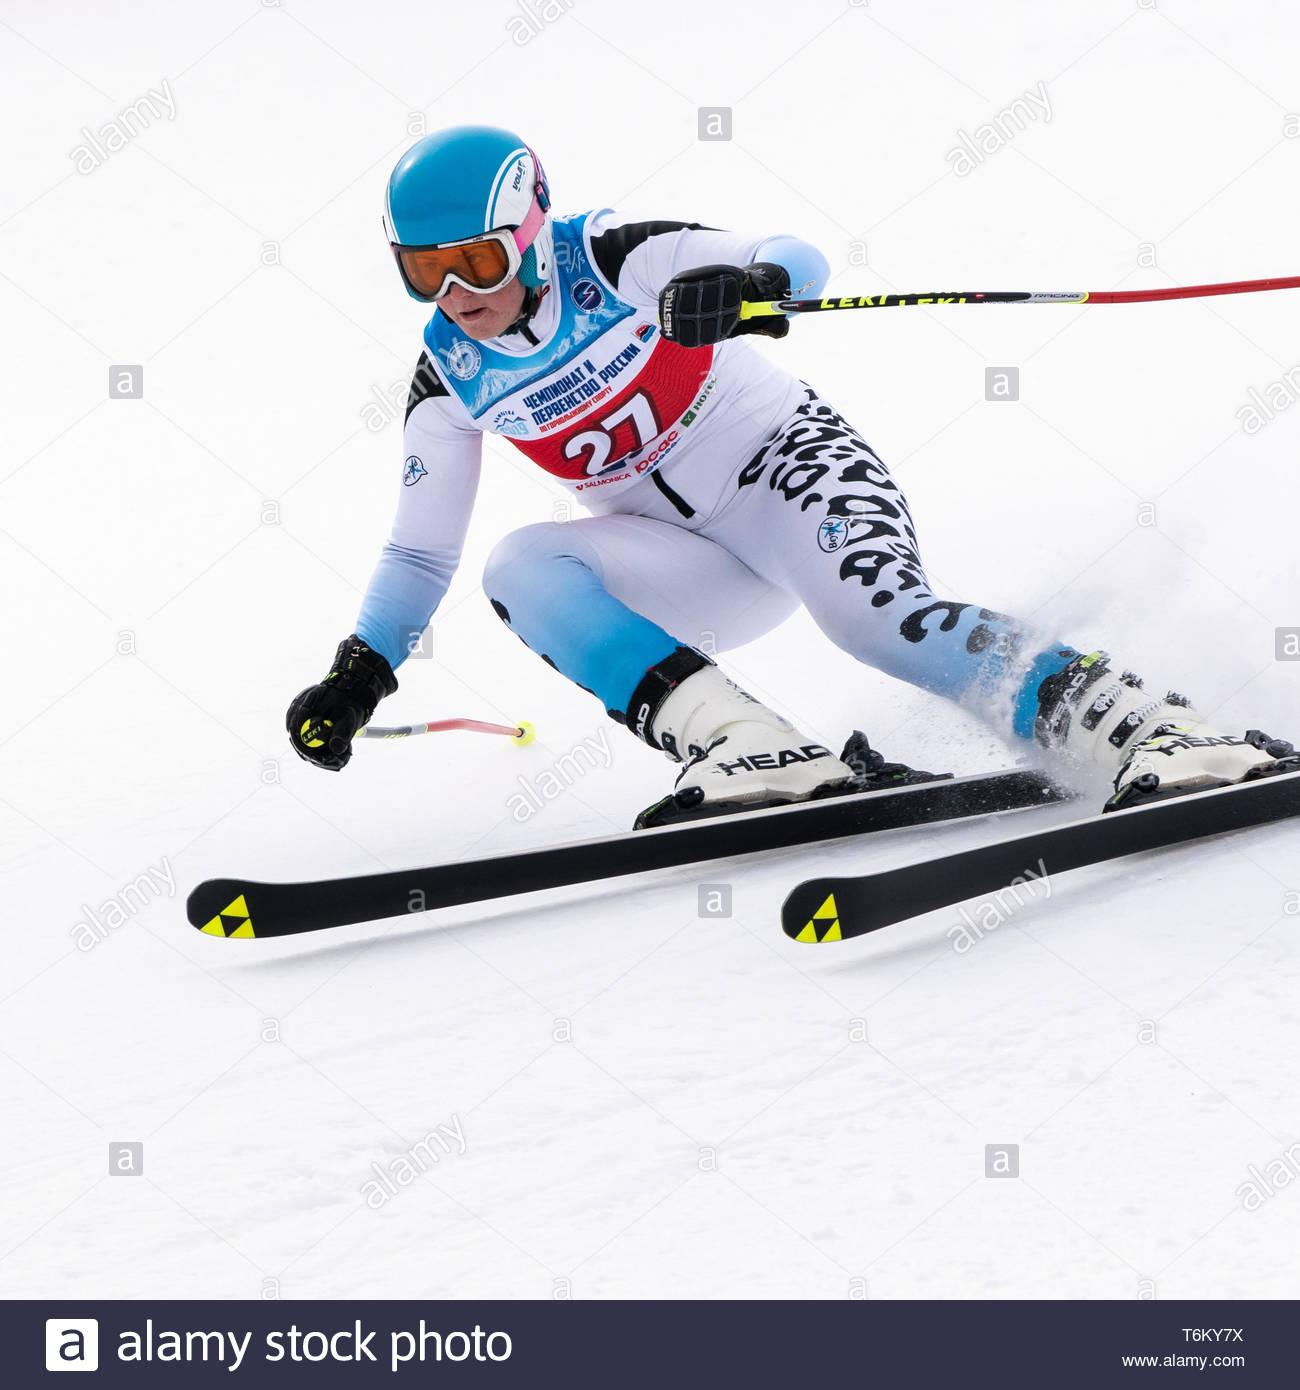 KAMCHATKA PENINSULA, RUSSIA - APRIL 2, 2019: Mountain skier Gavrish Veronika (Murmansk) skiing down mount. Russian Women's Alpine Skiing Cup, Internat - Stock Image